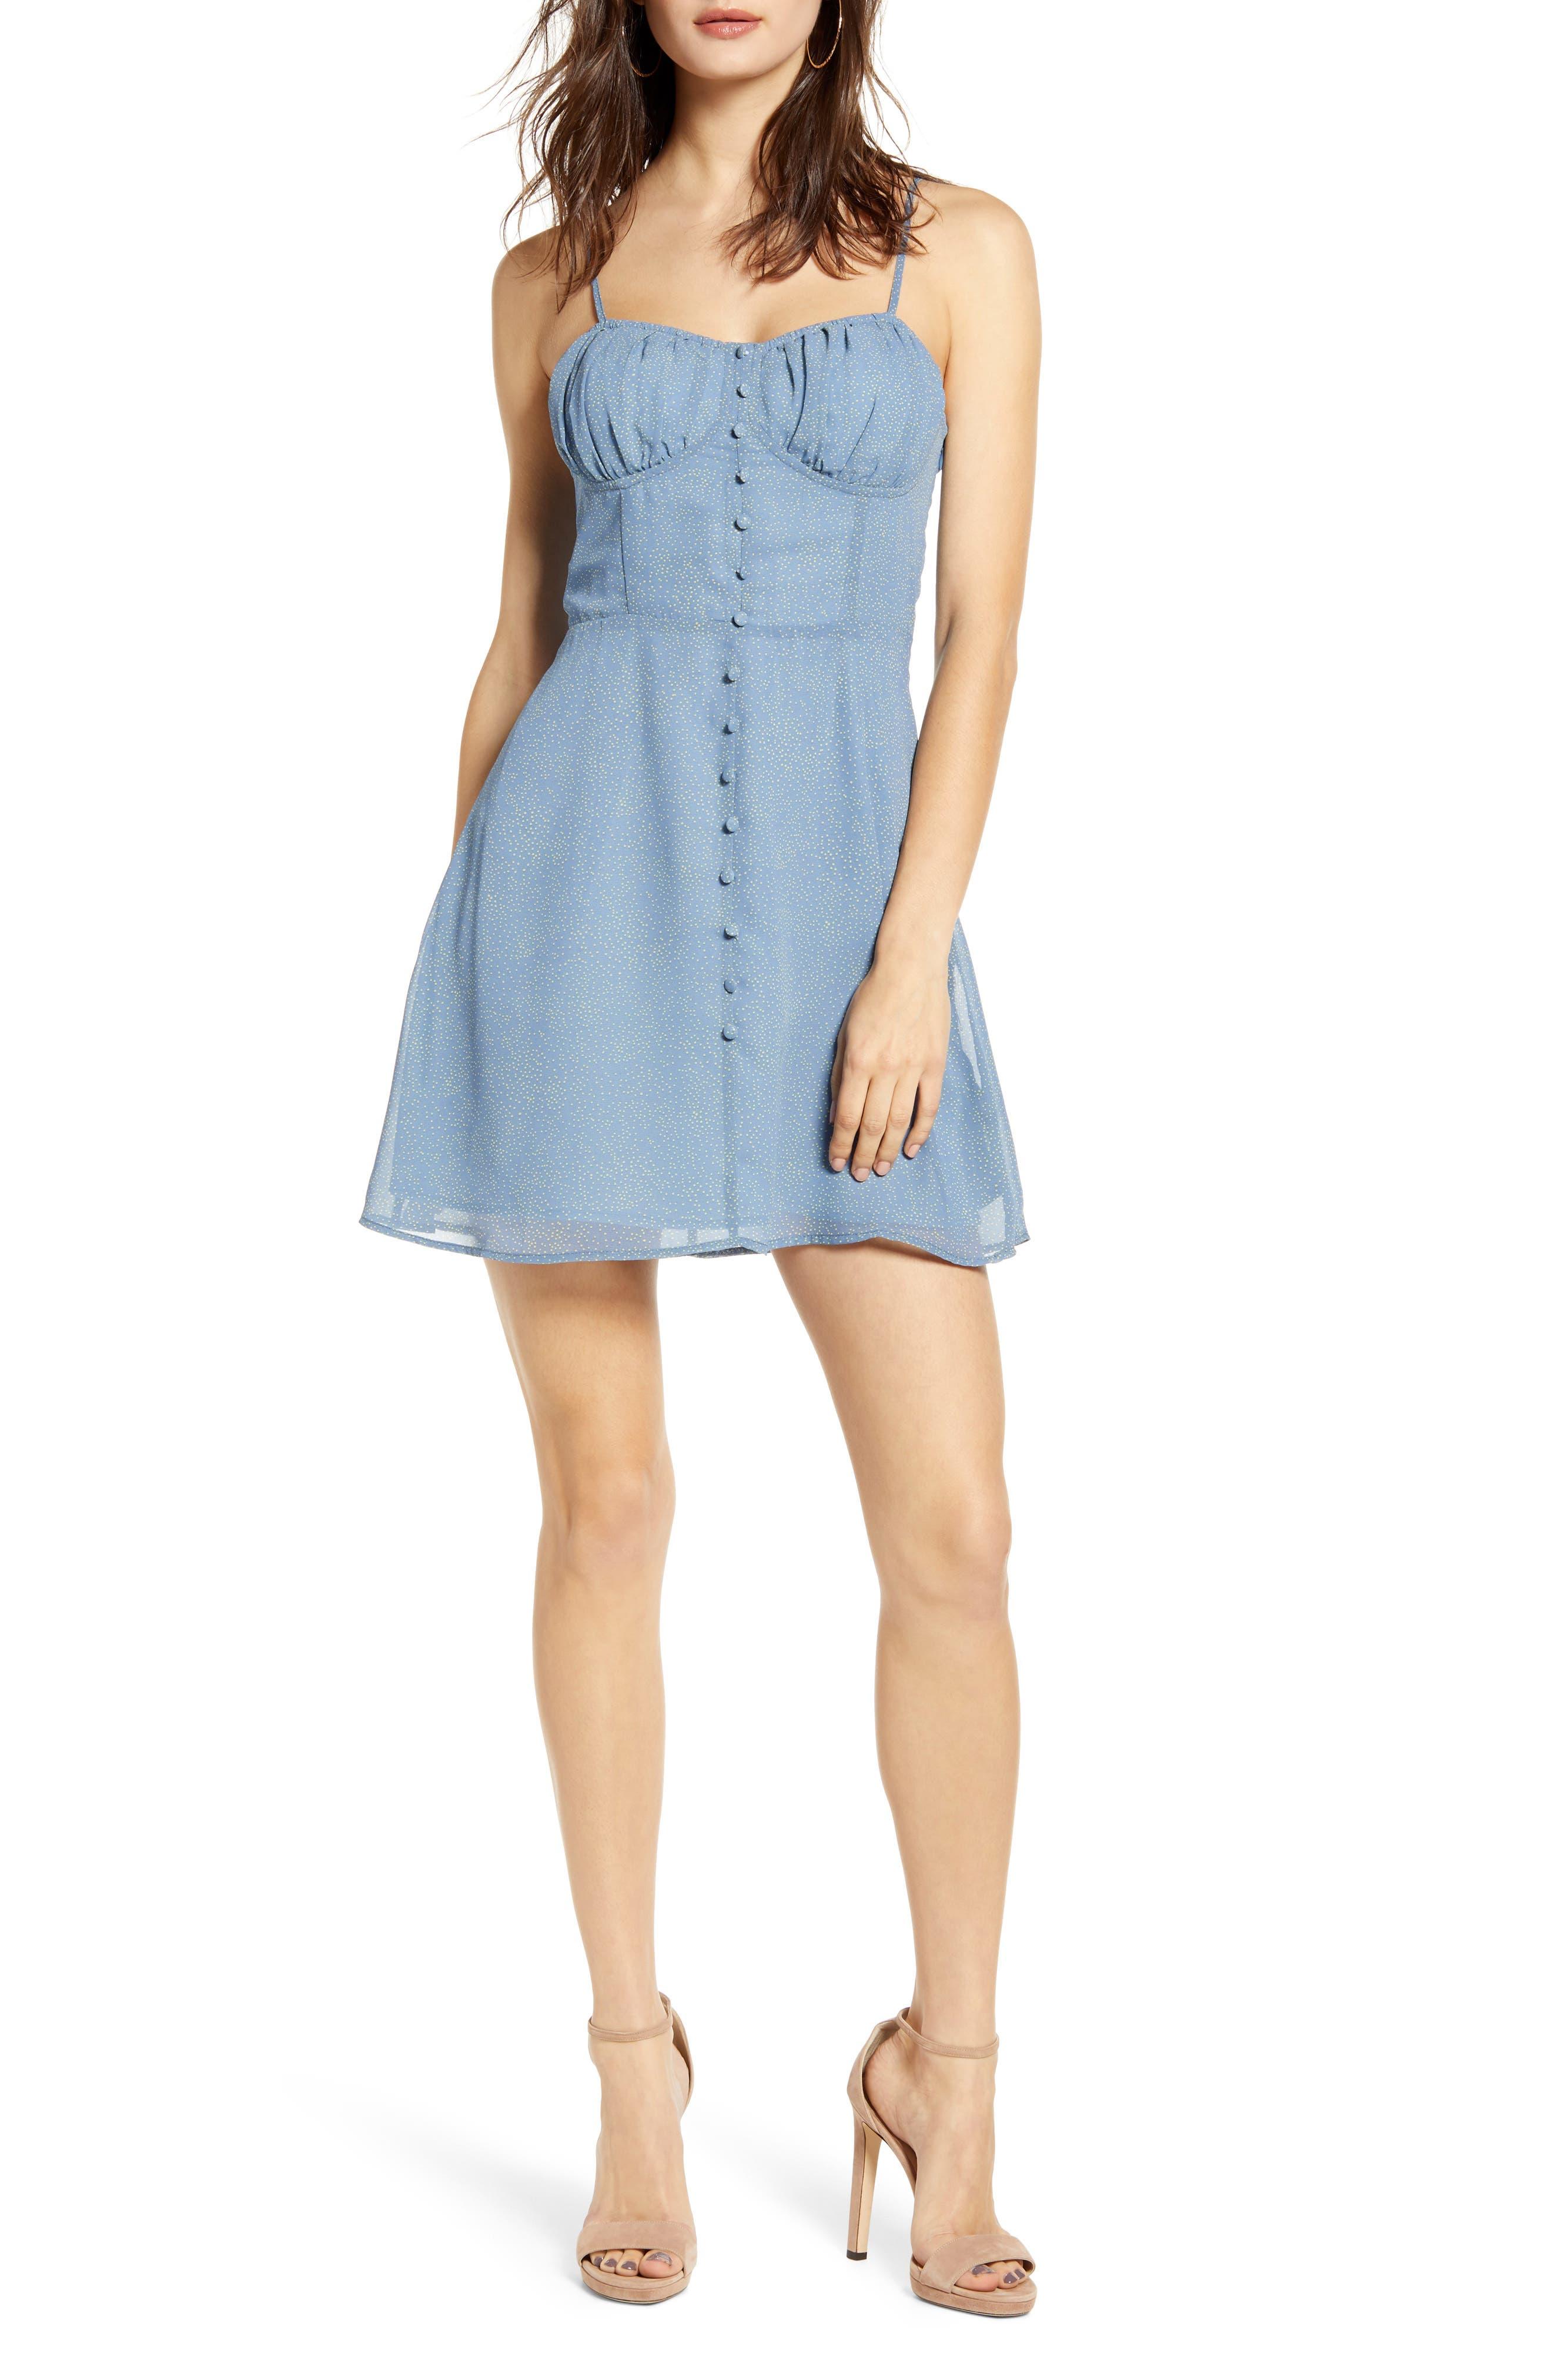 J.o.a. Sleeveless Minidress, Blue